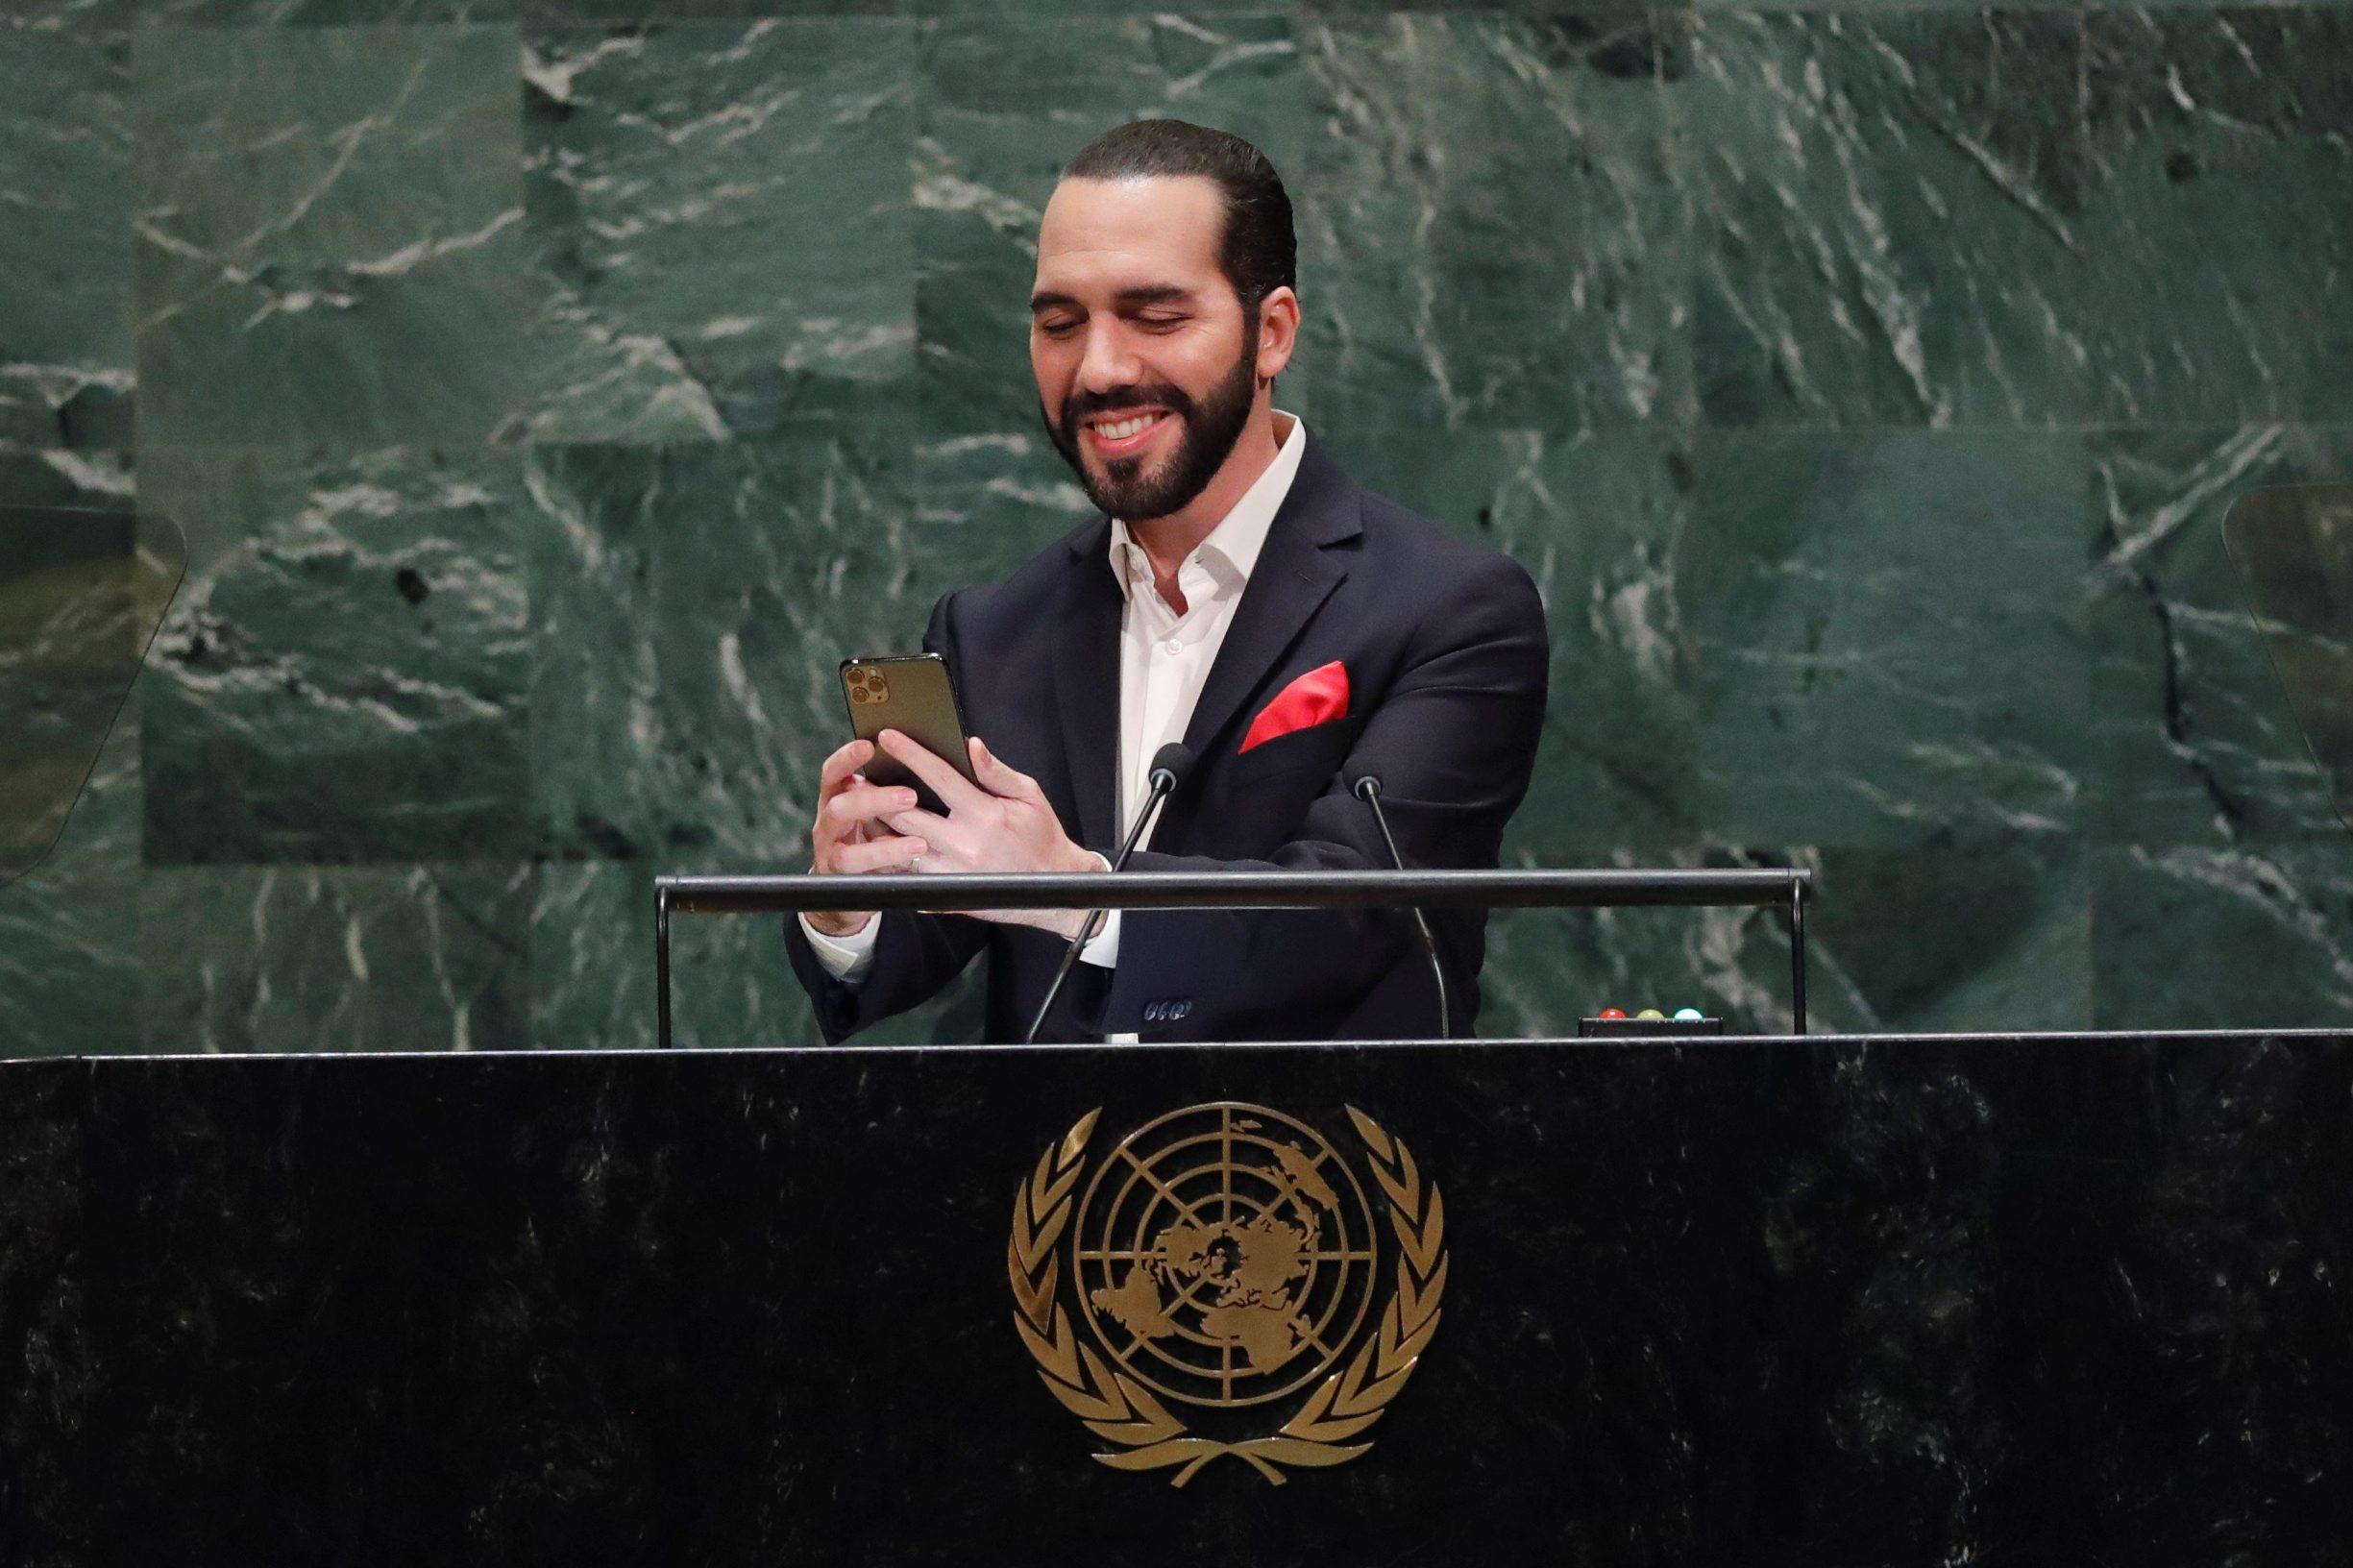 Predsjednik El Salvadora Nayib Bukele